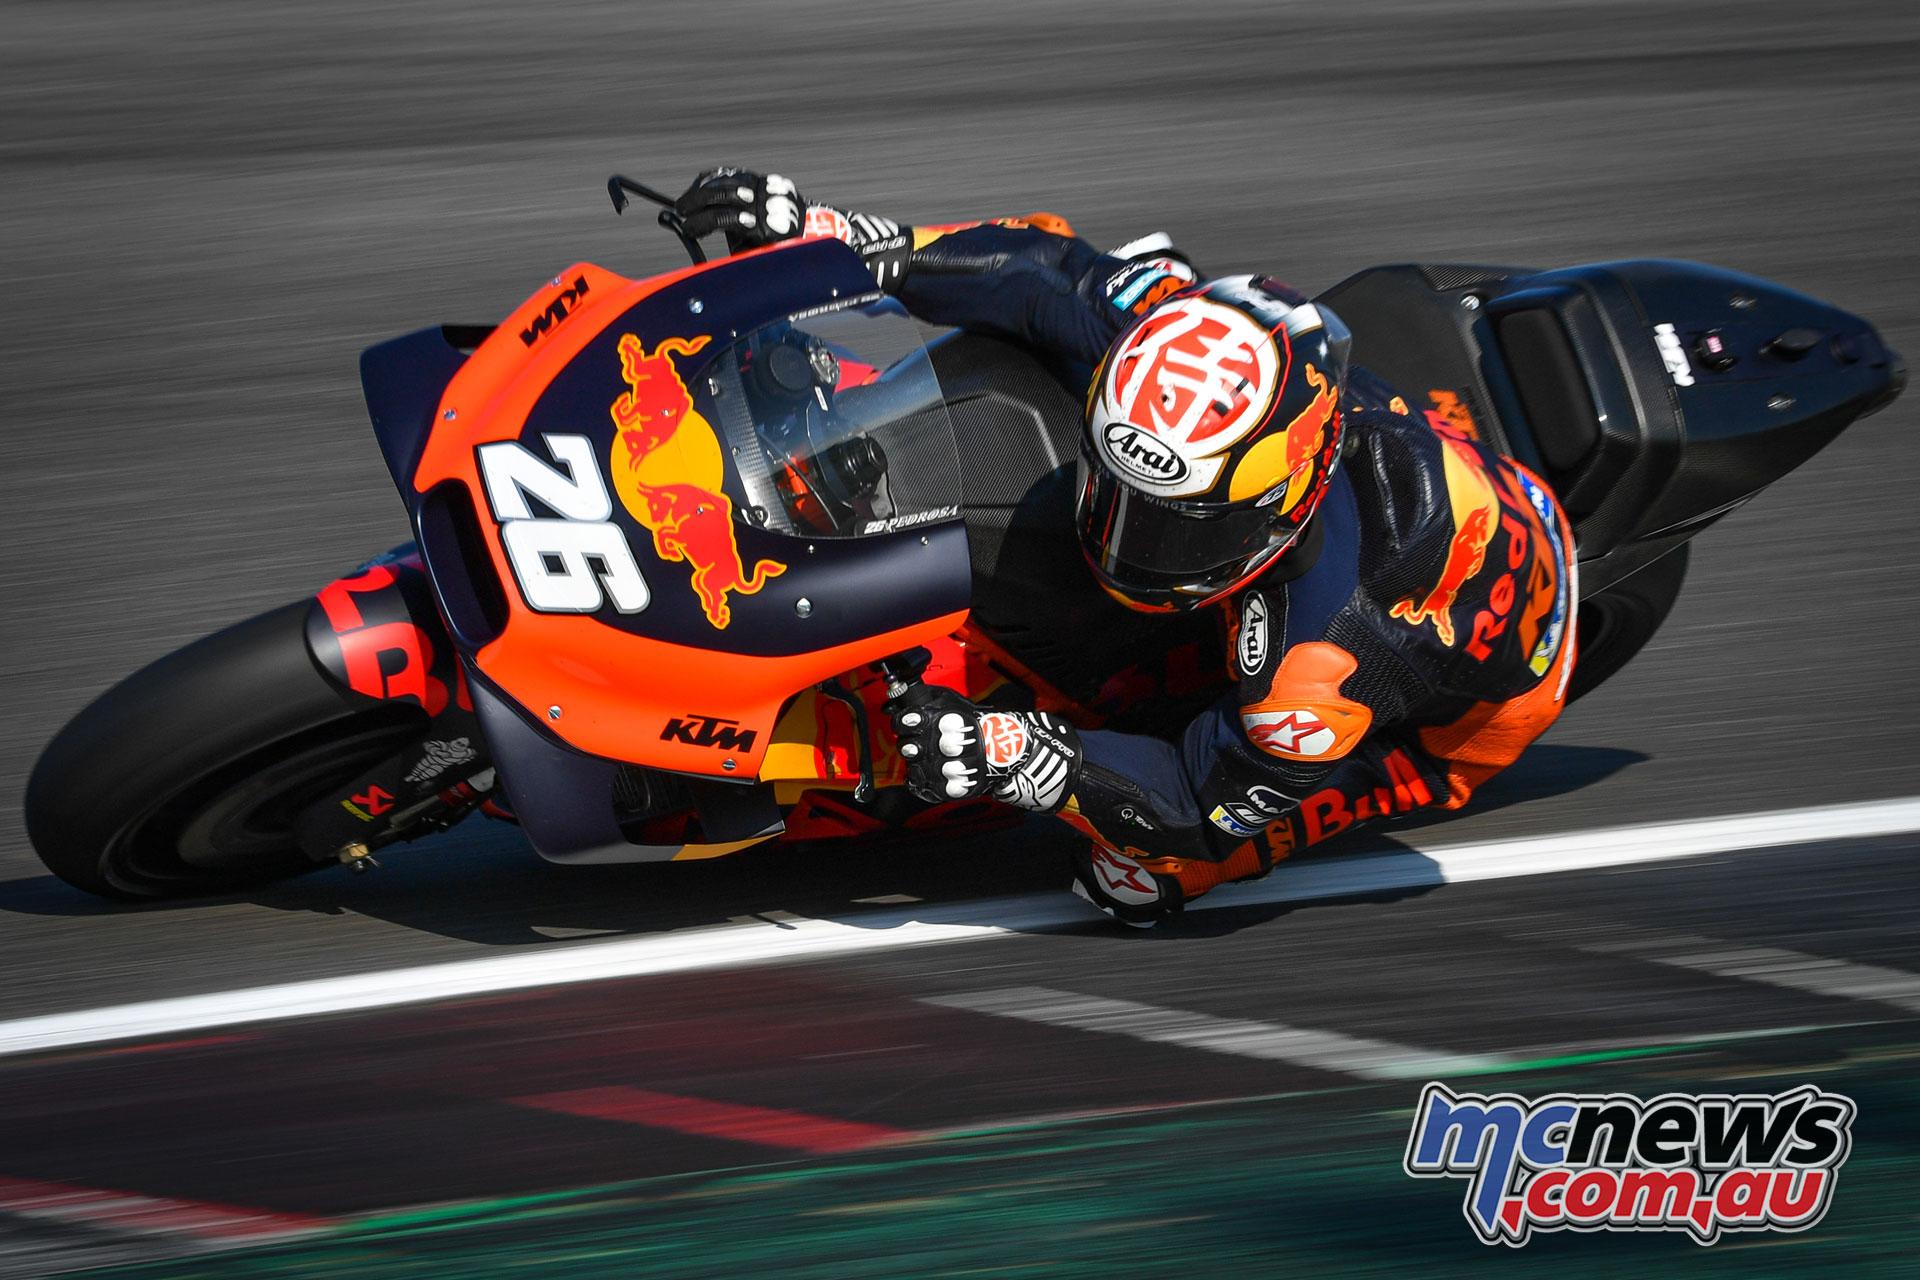 MotoGP Test Misano D Pedrosa